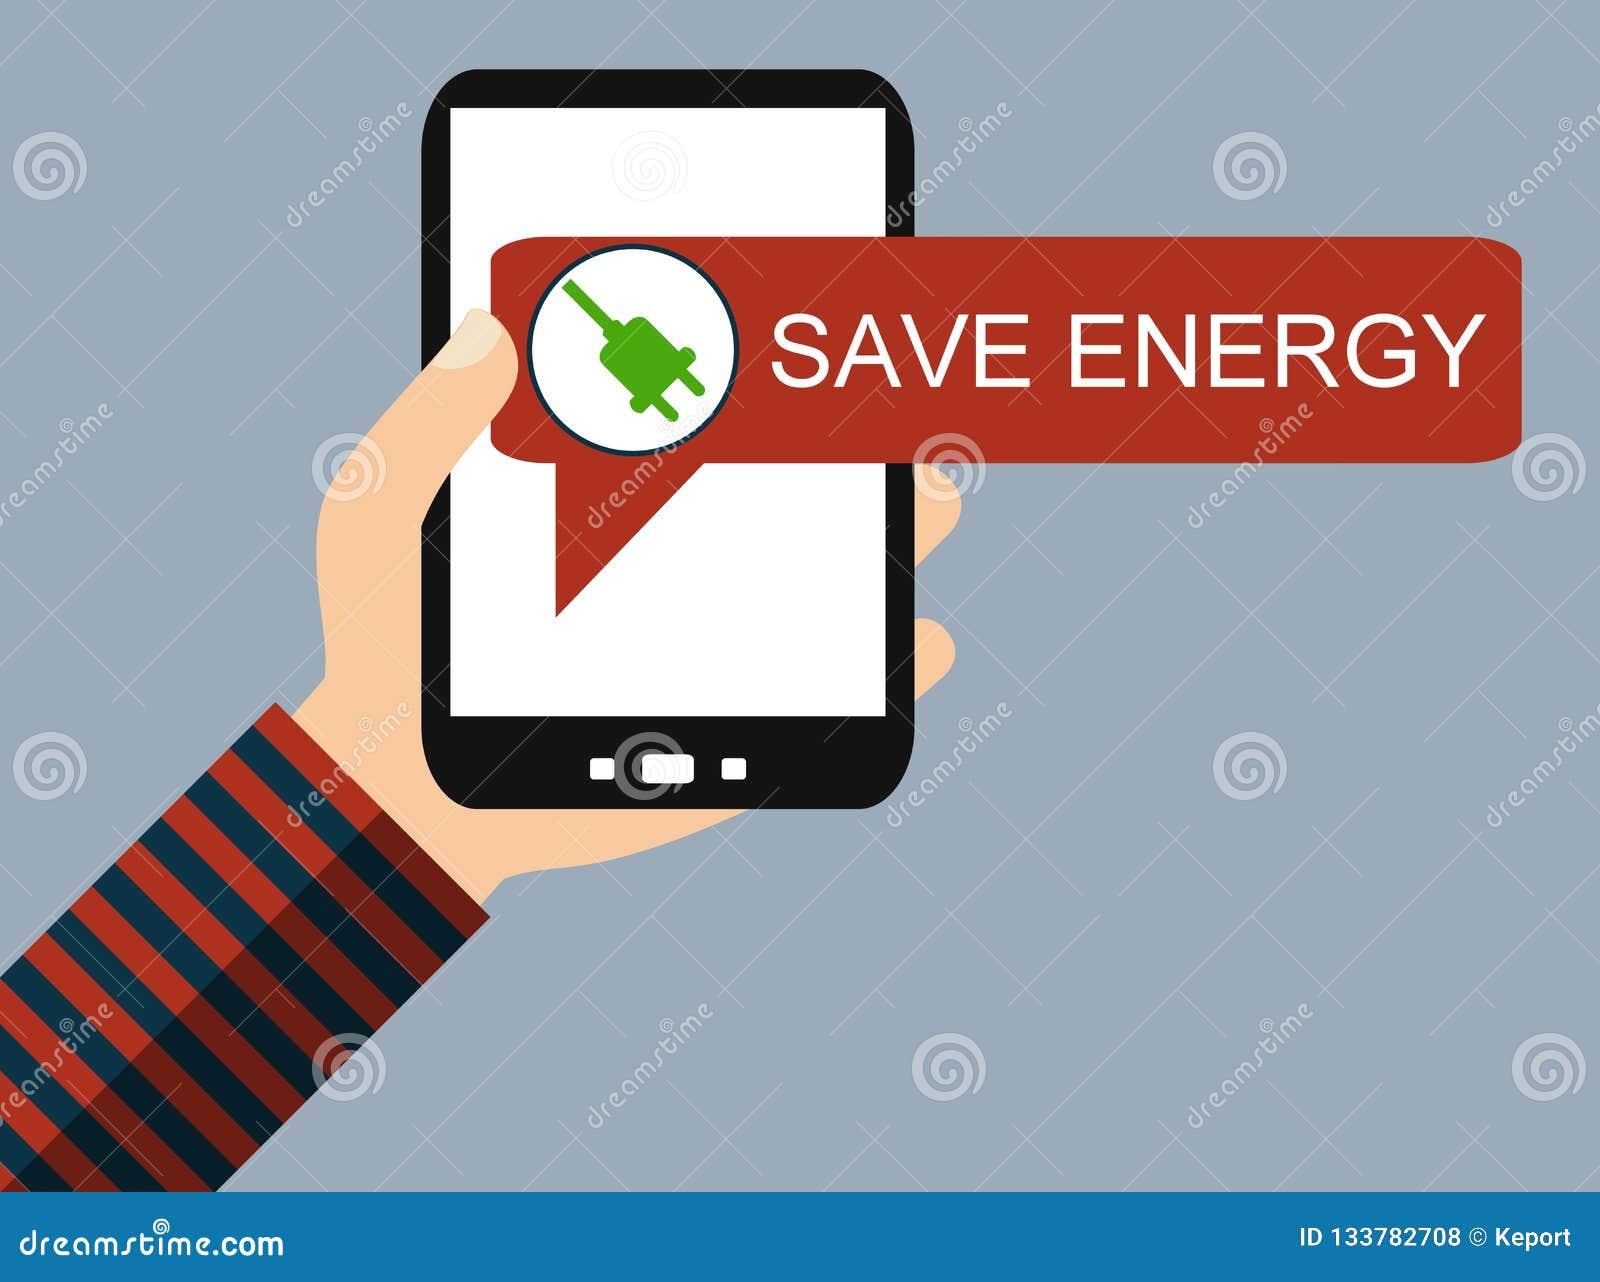 Mobile Phone: Save Energy - Flat Design